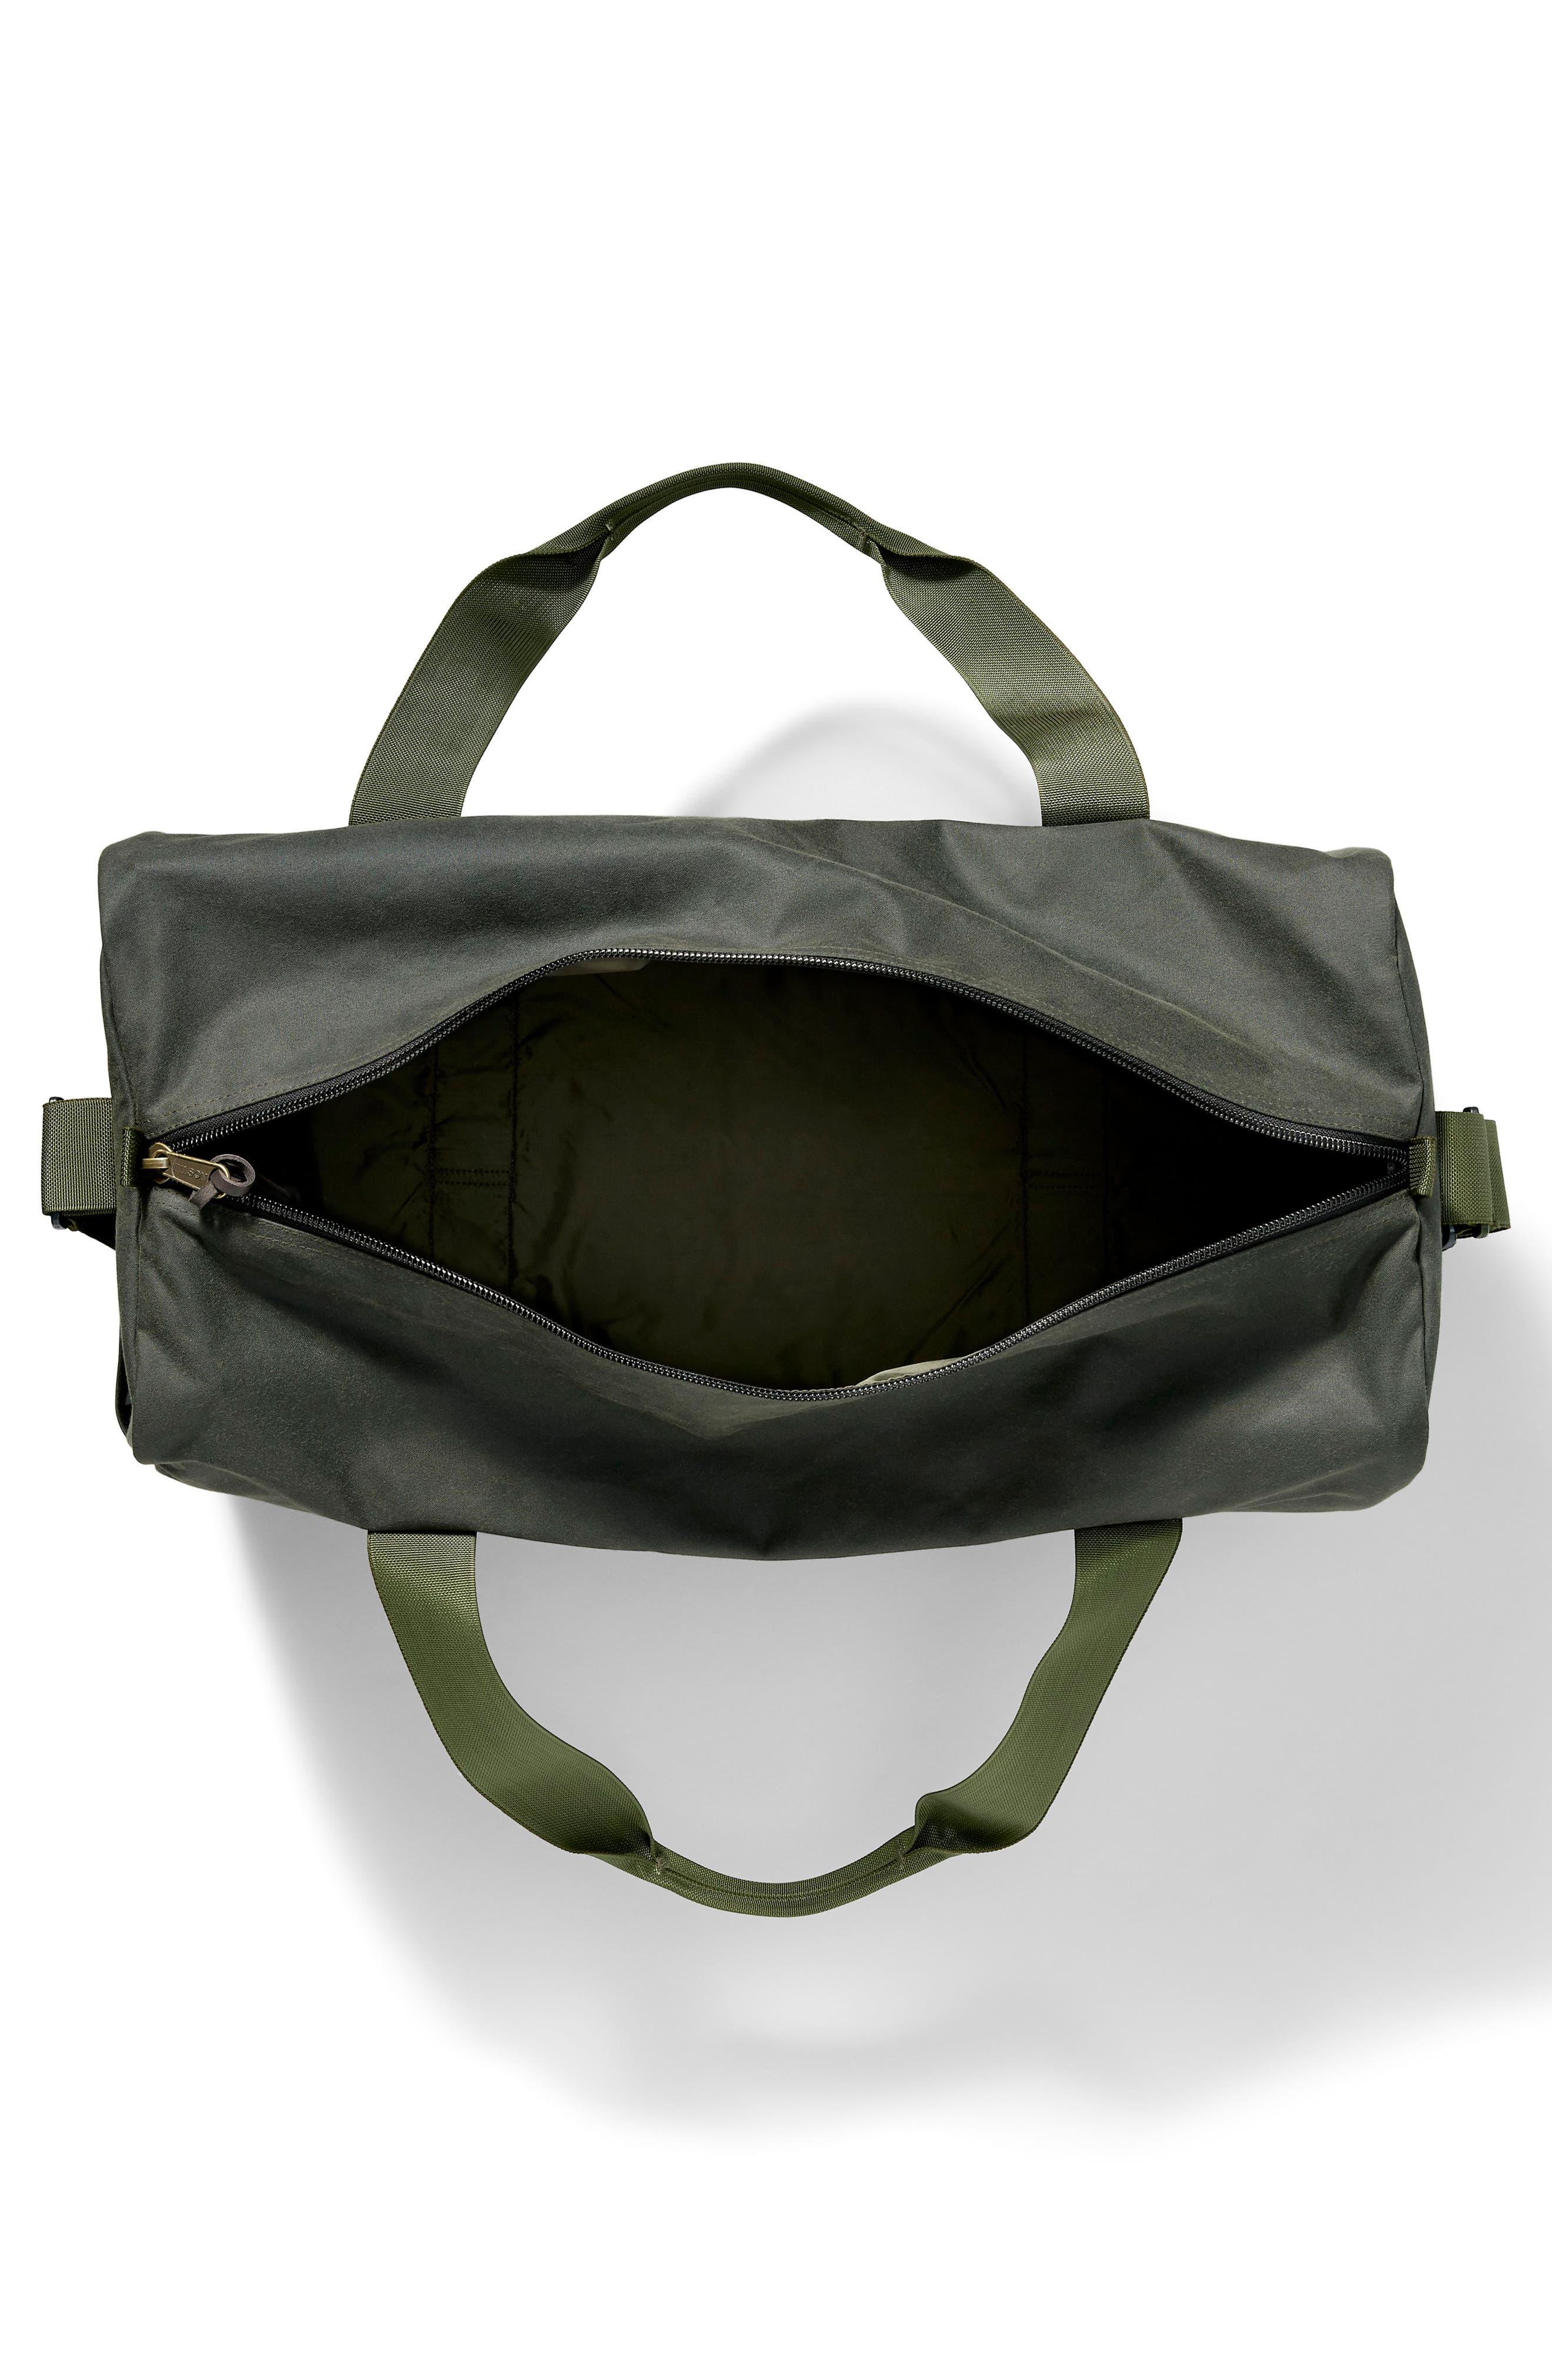 FILSON,                             Medium Field Duffel Bag,                             Alternate thumbnail 3, color,                             SPRUCE